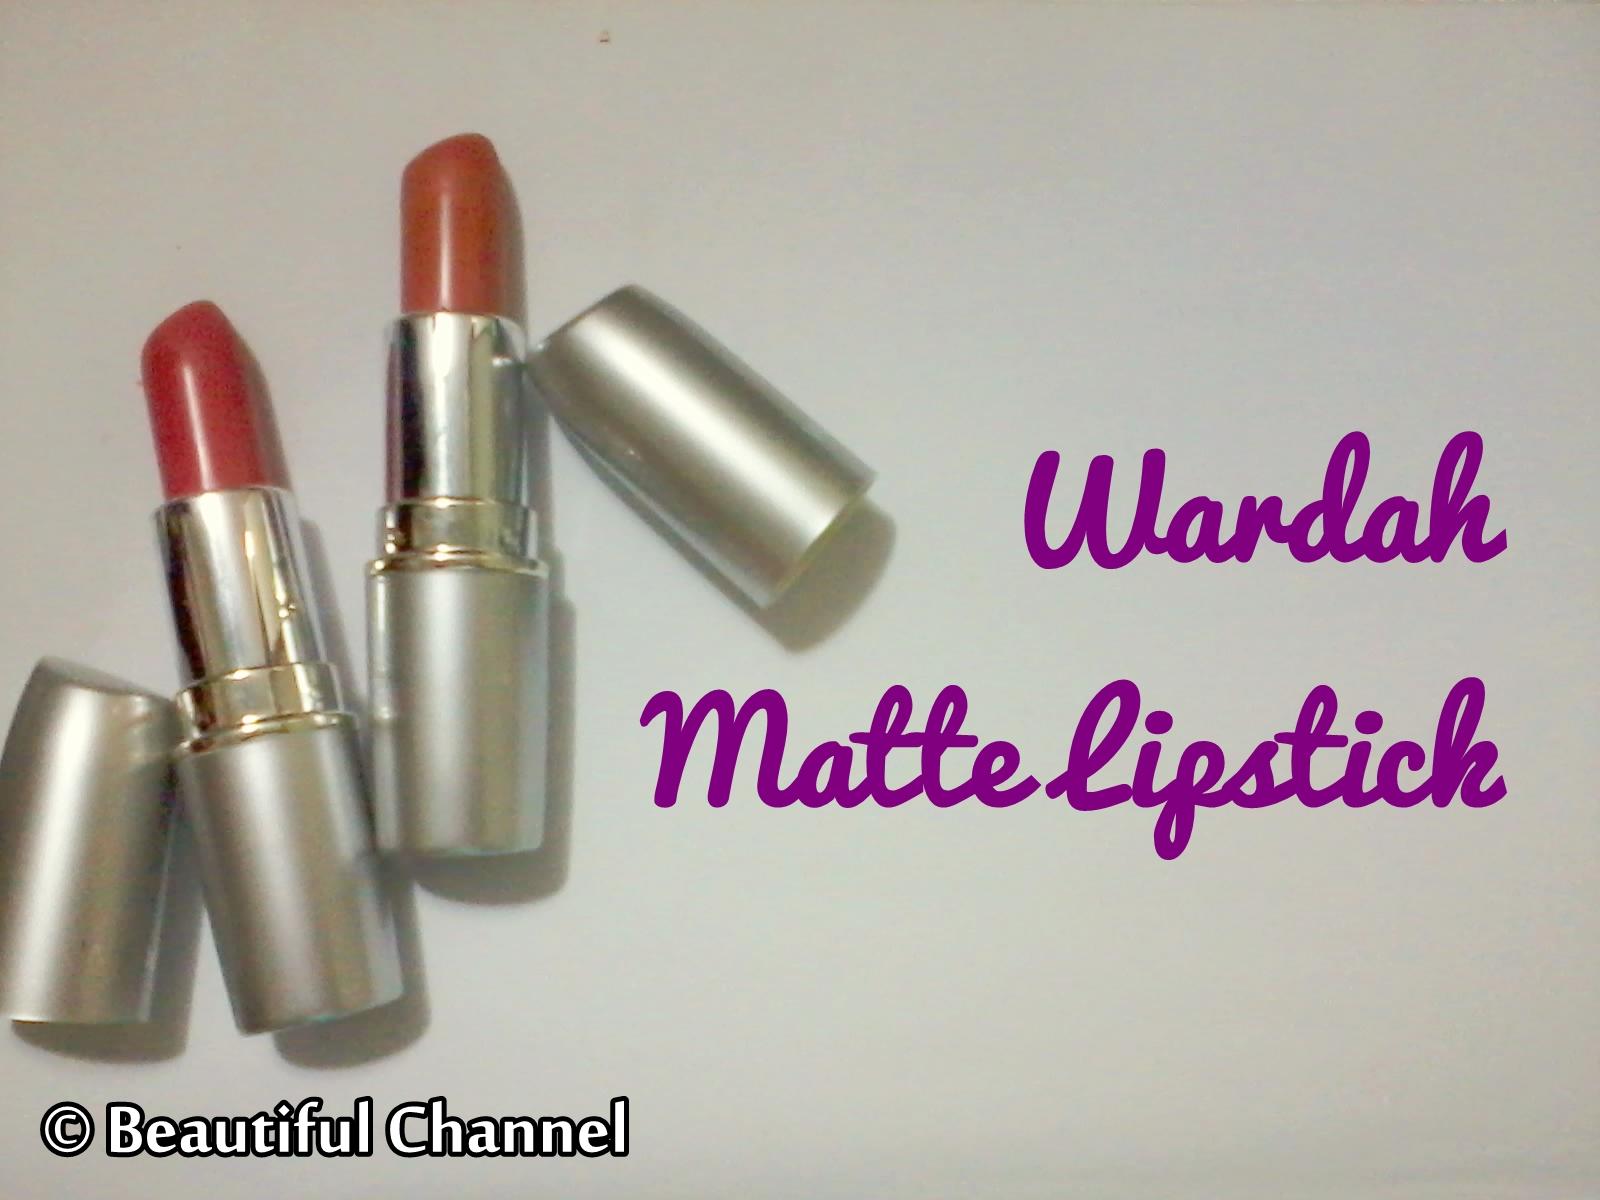 Beautiful Channel: Review: Wardah Matte Lipstick